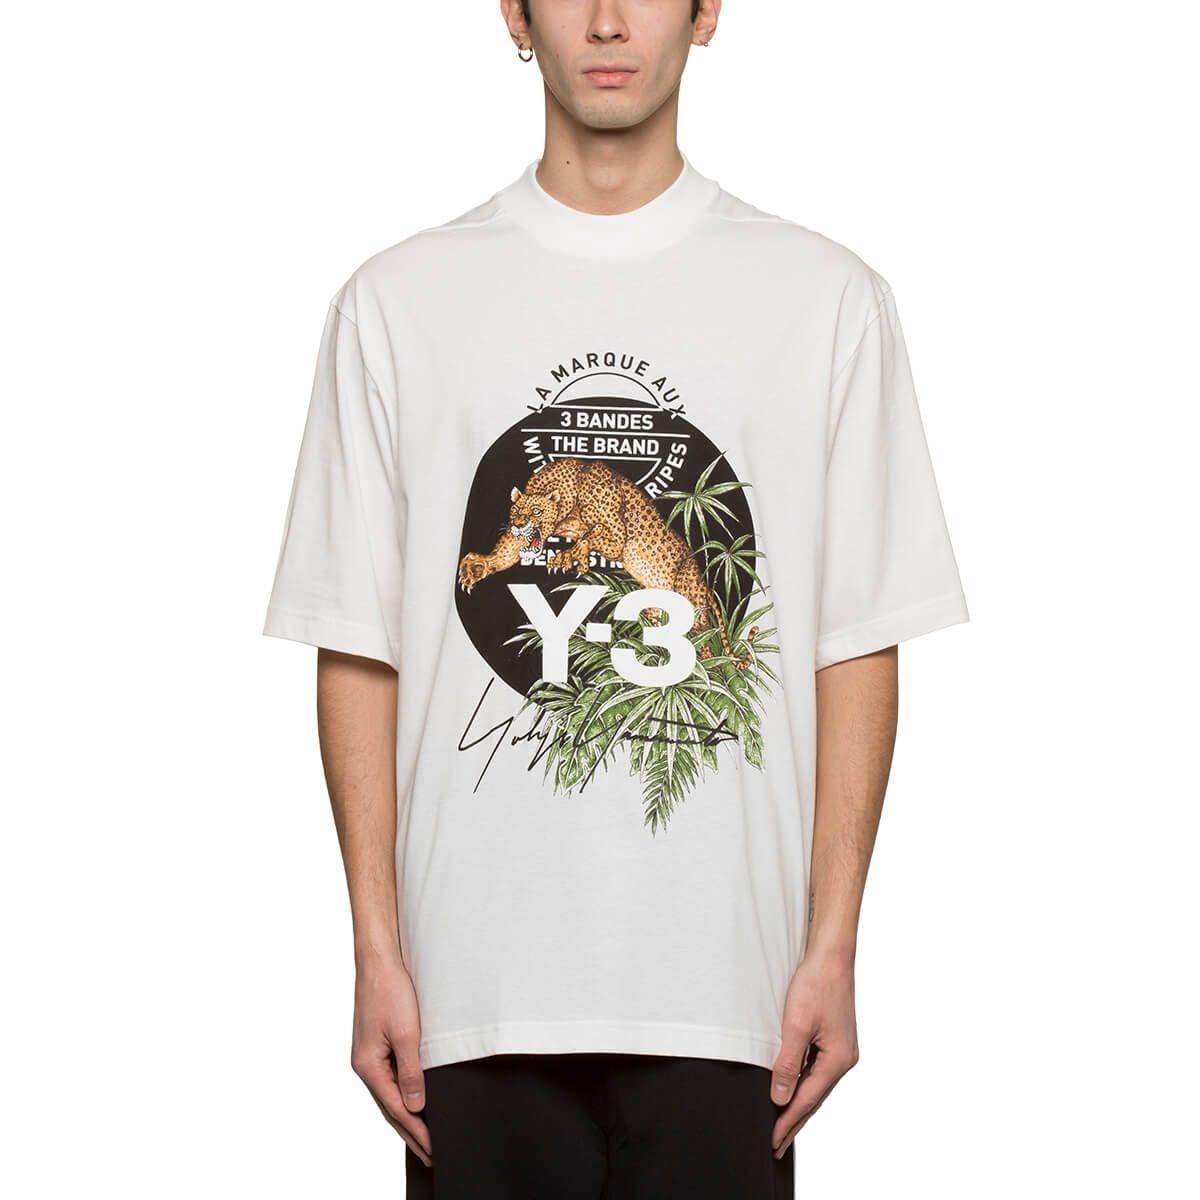 1cf5feb8634d Compre 2019 Novos Homens T Shirt Panther Graphic Tee Estilo ...